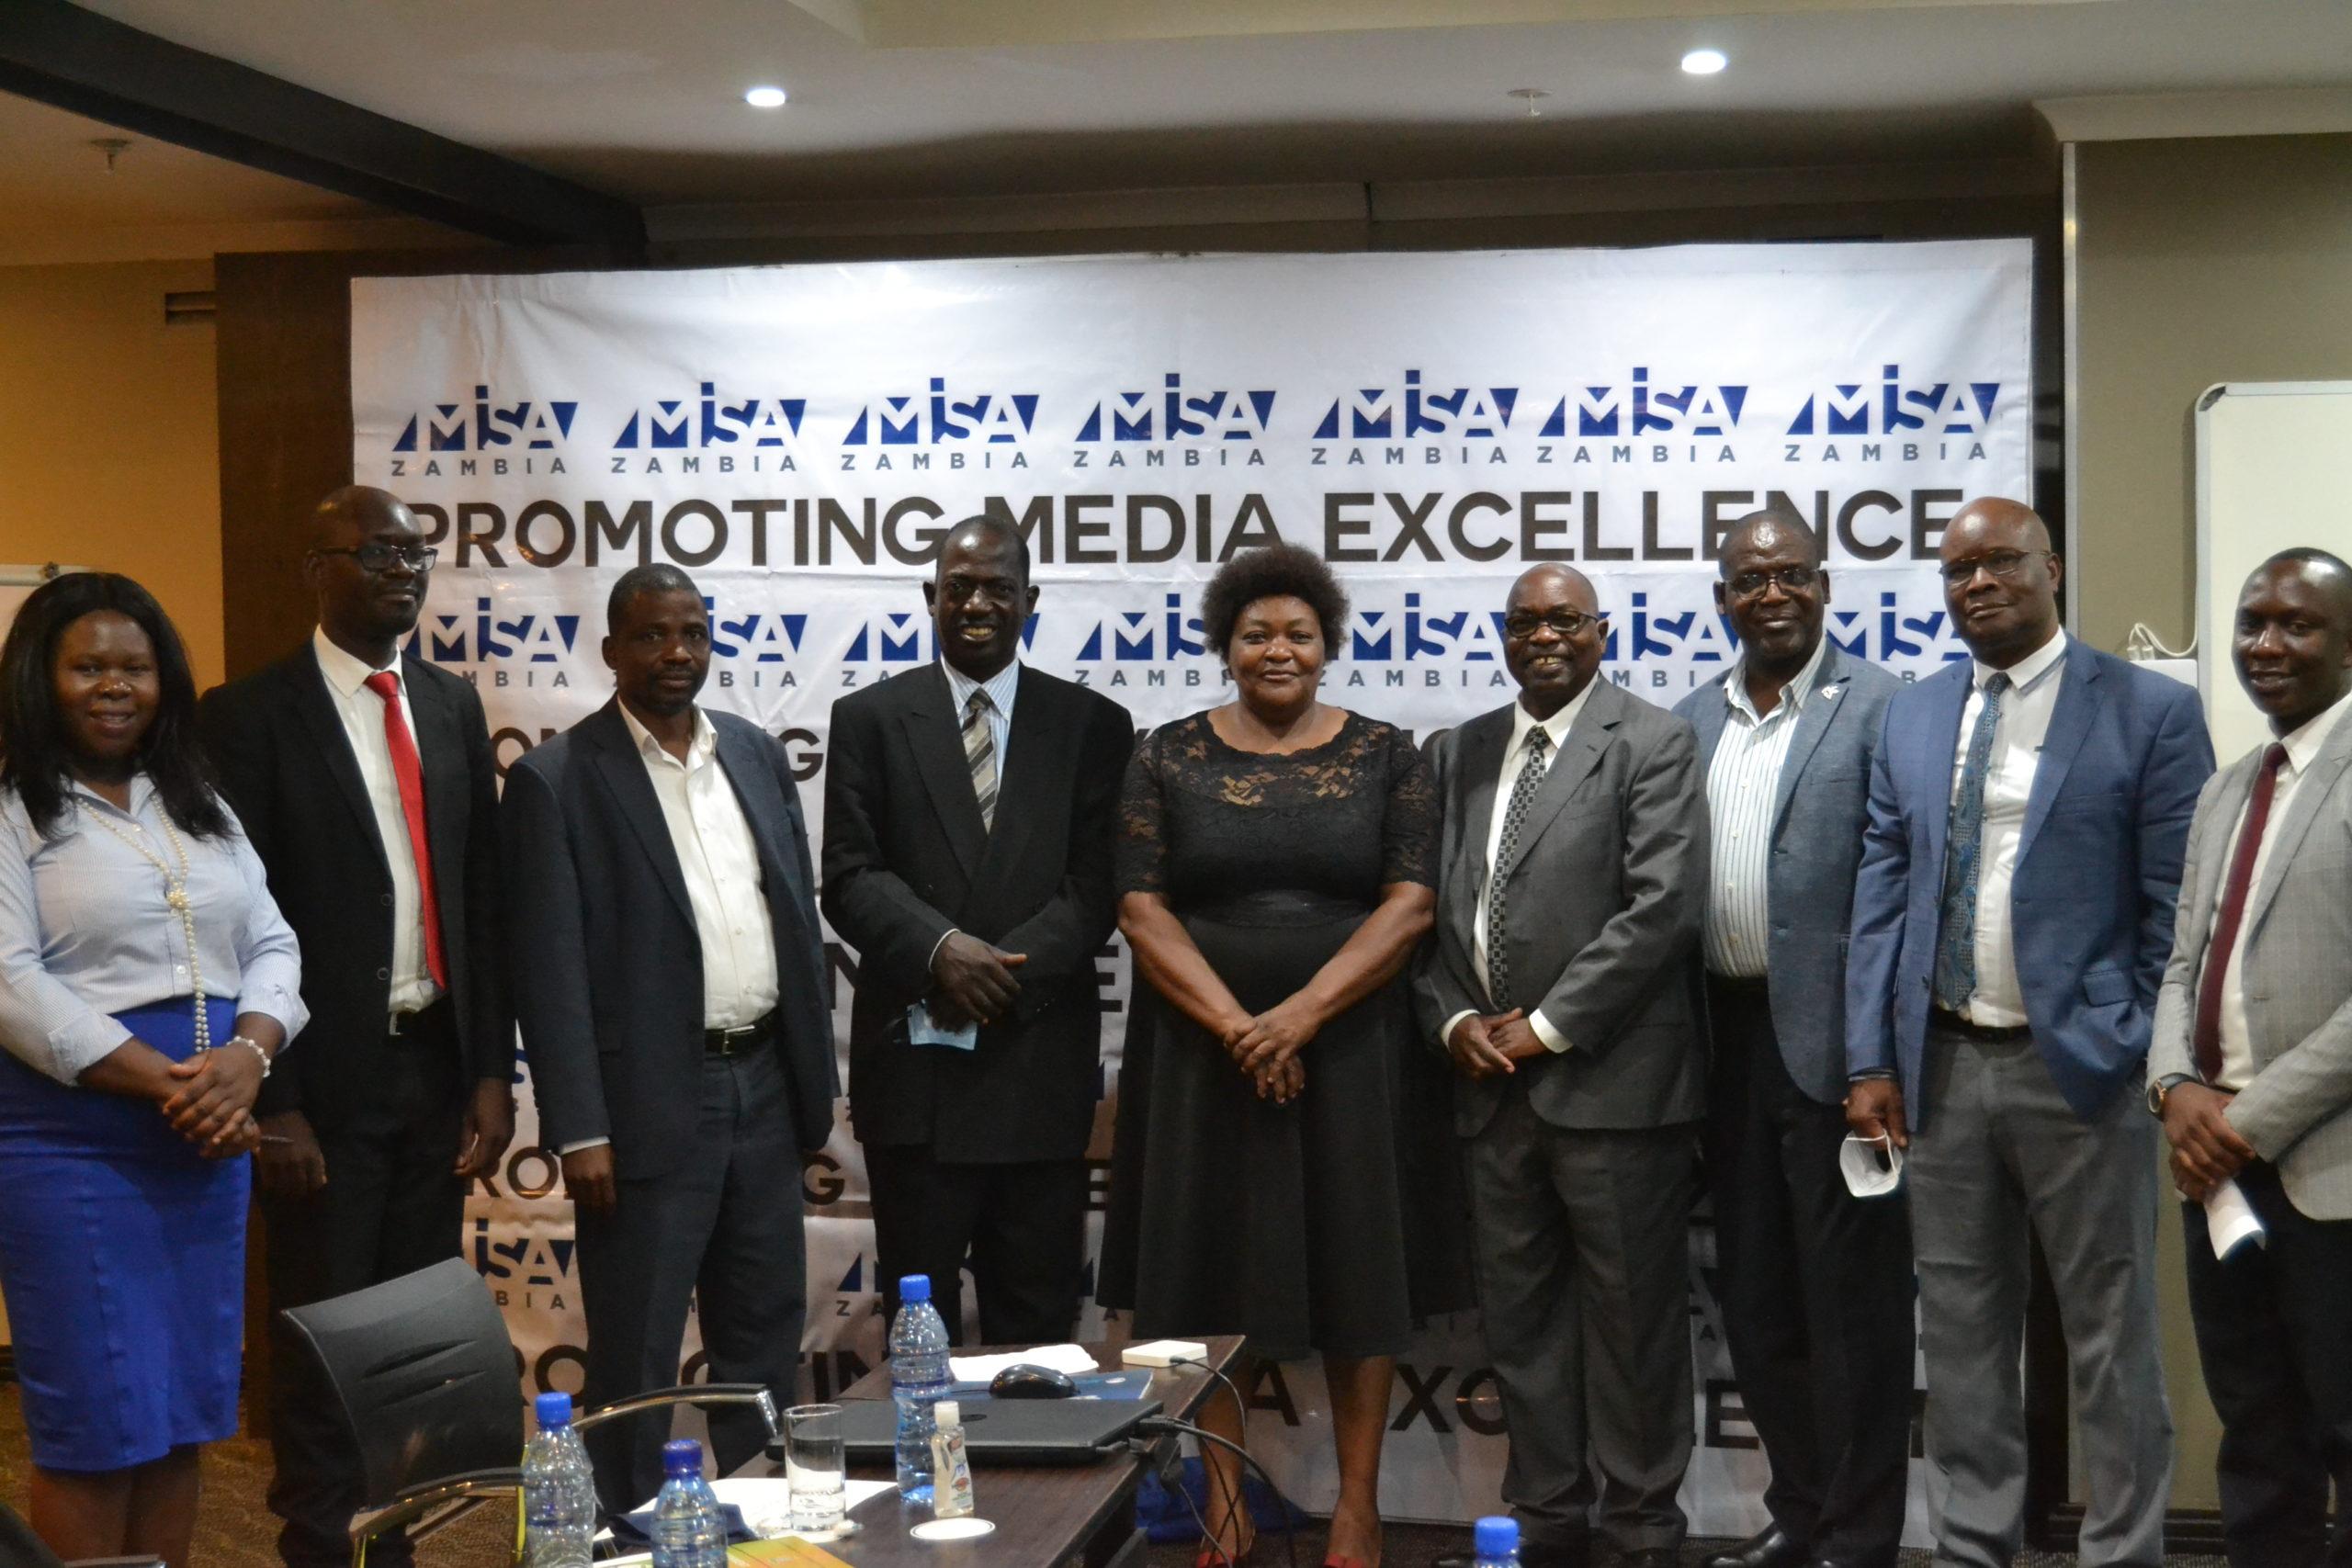 Free media is crucial to development: MISA Zambia